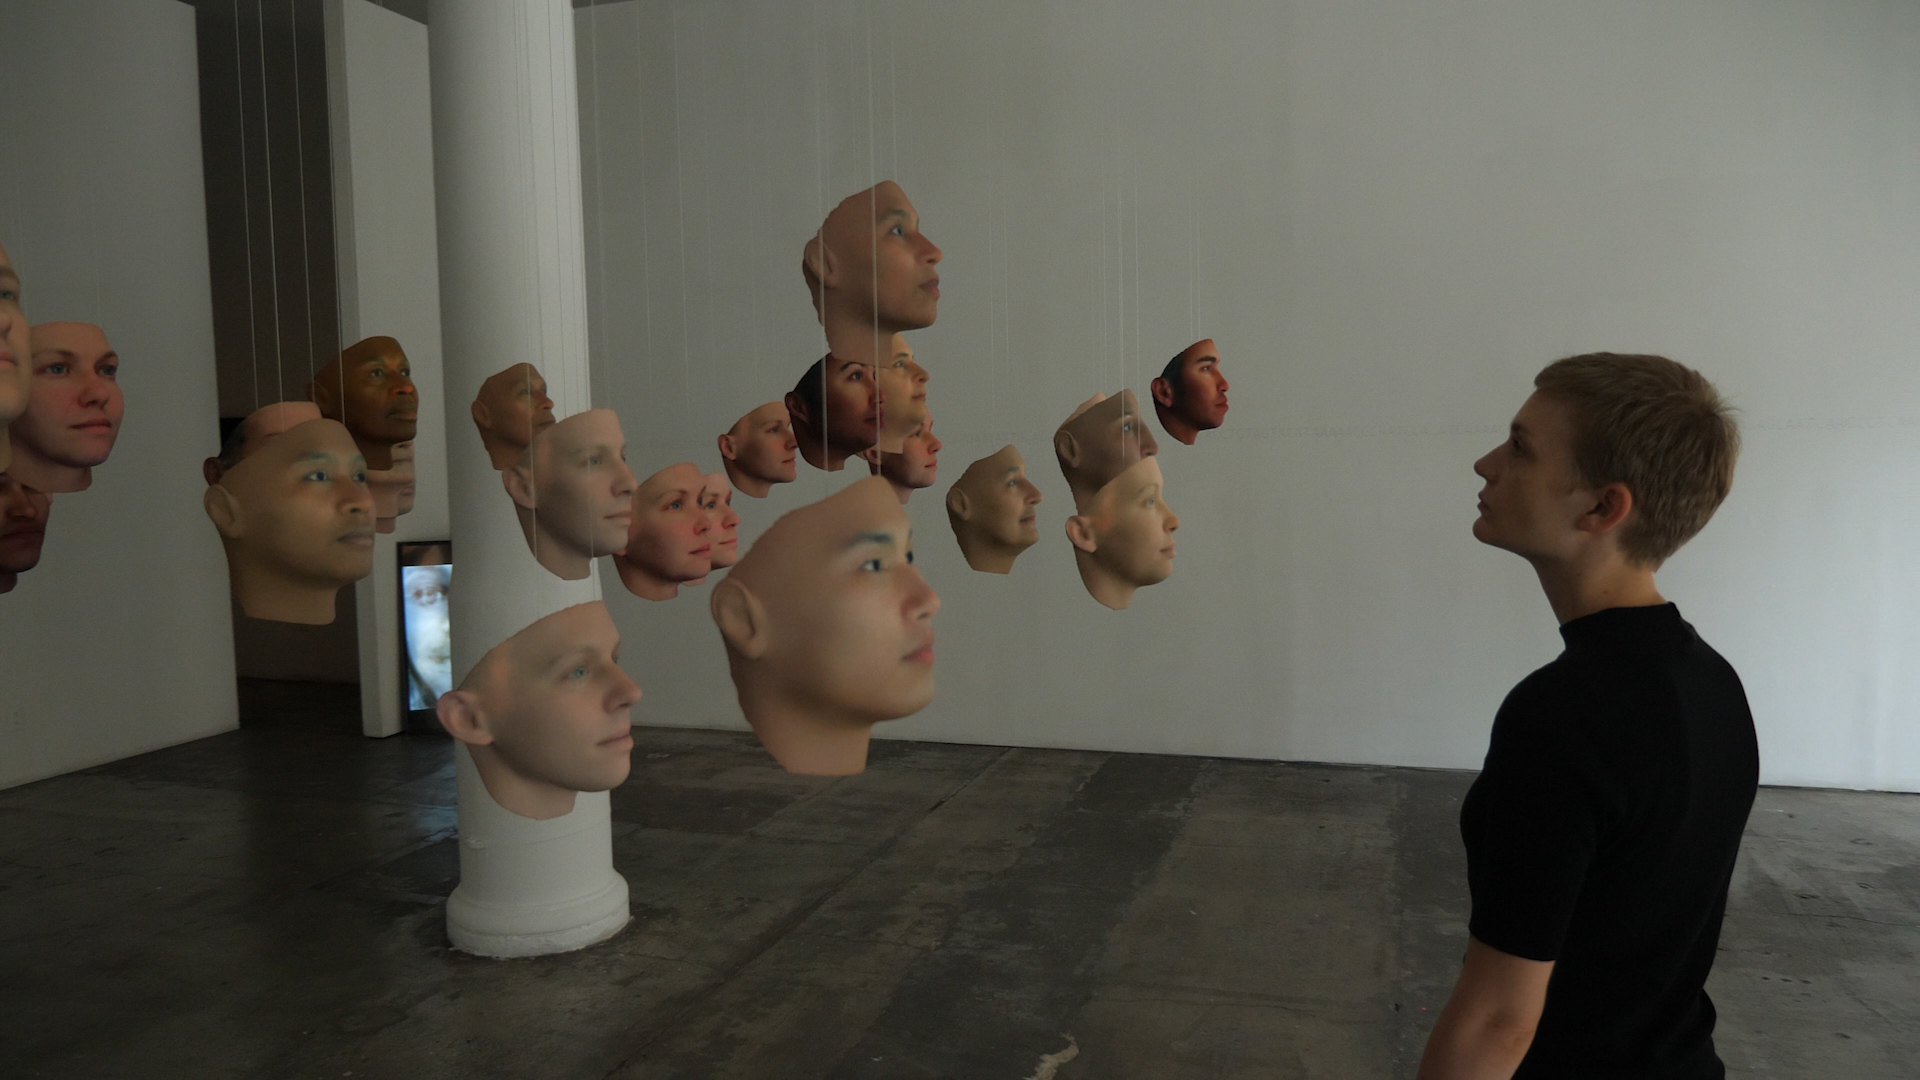 Articulate — The Information Artist